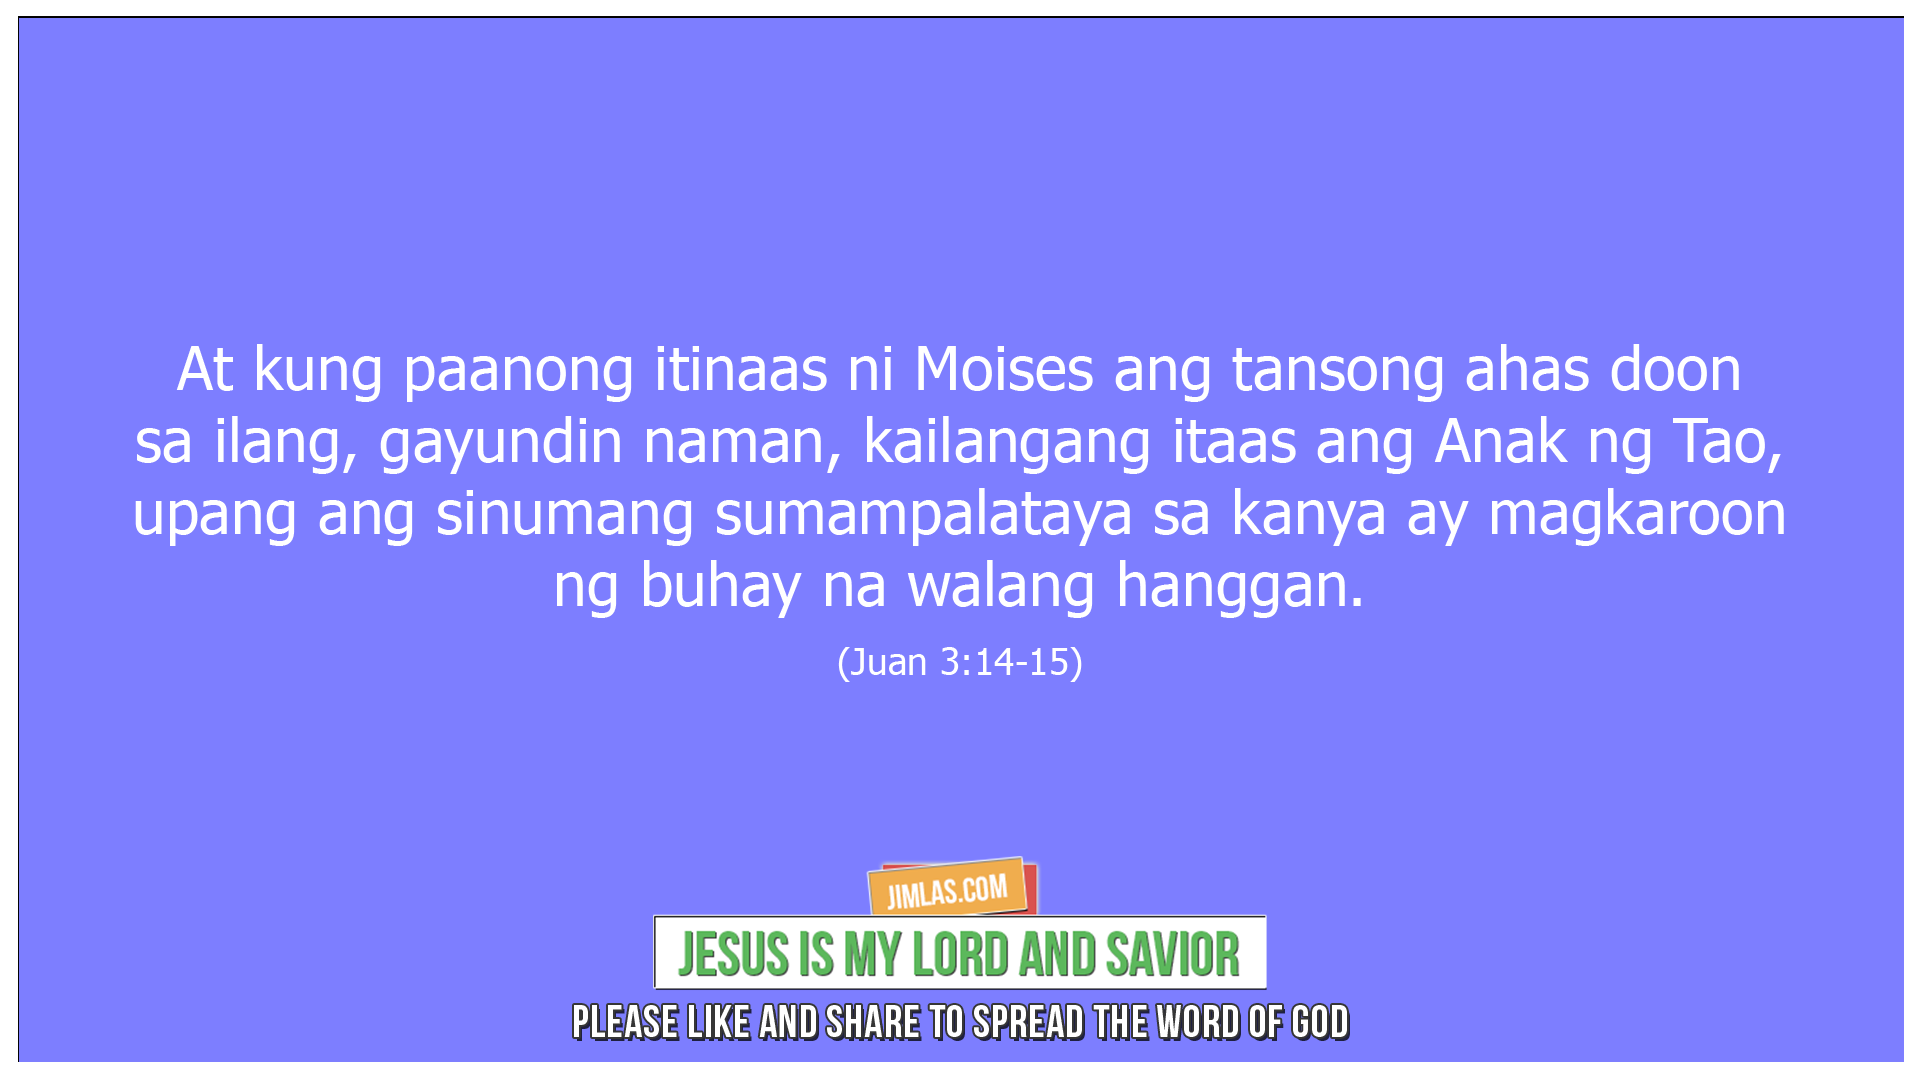 Juan 3 14-15, Juan 3:14-15